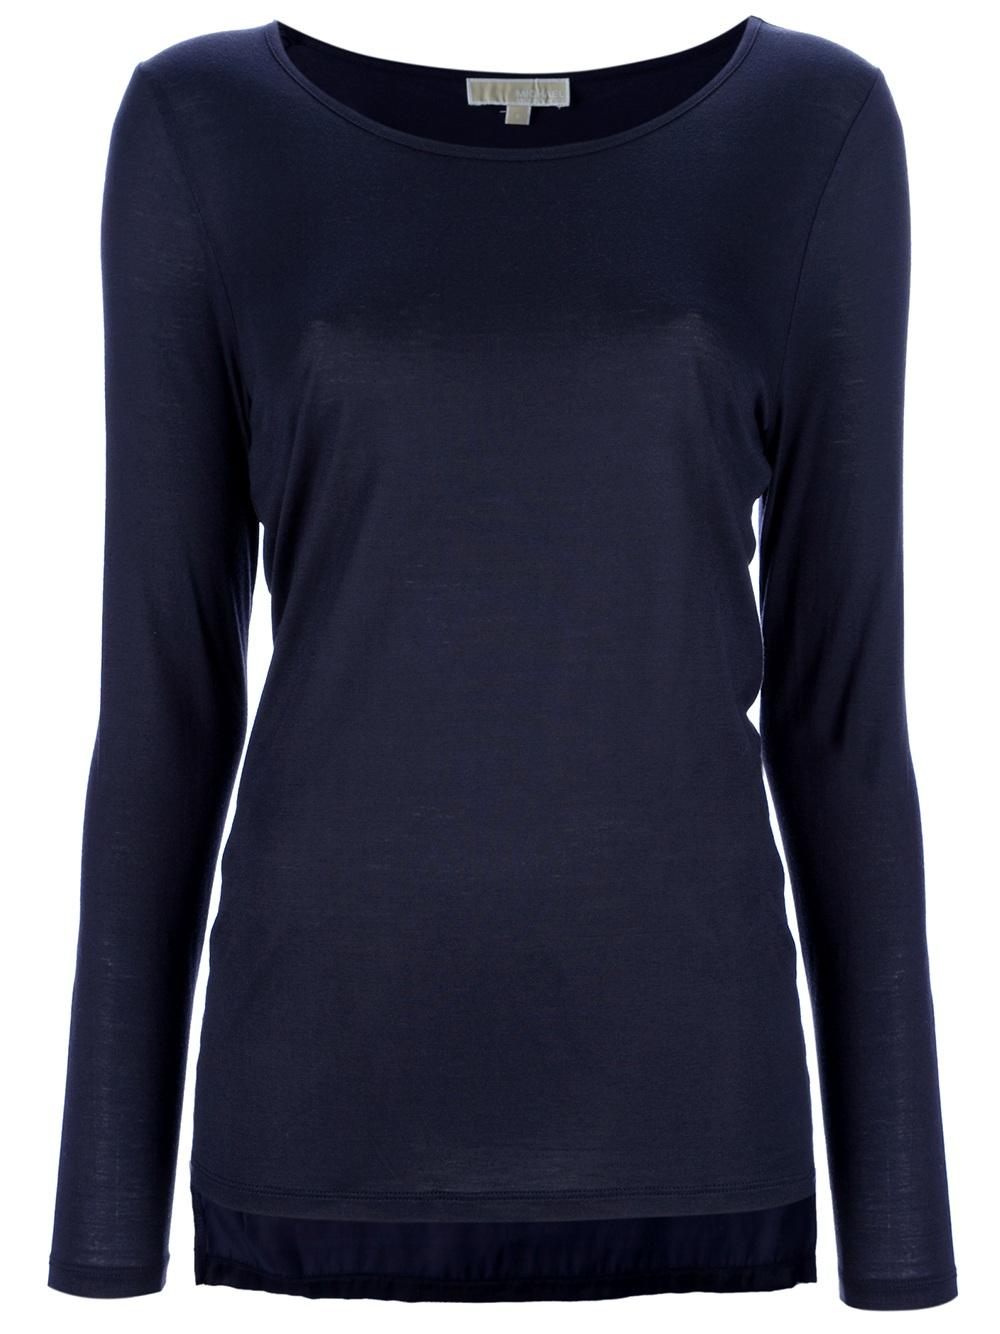 michael kors long sleeve t shirt in blue black lyst. Black Bedroom Furniture Sets. Home Design Ideas